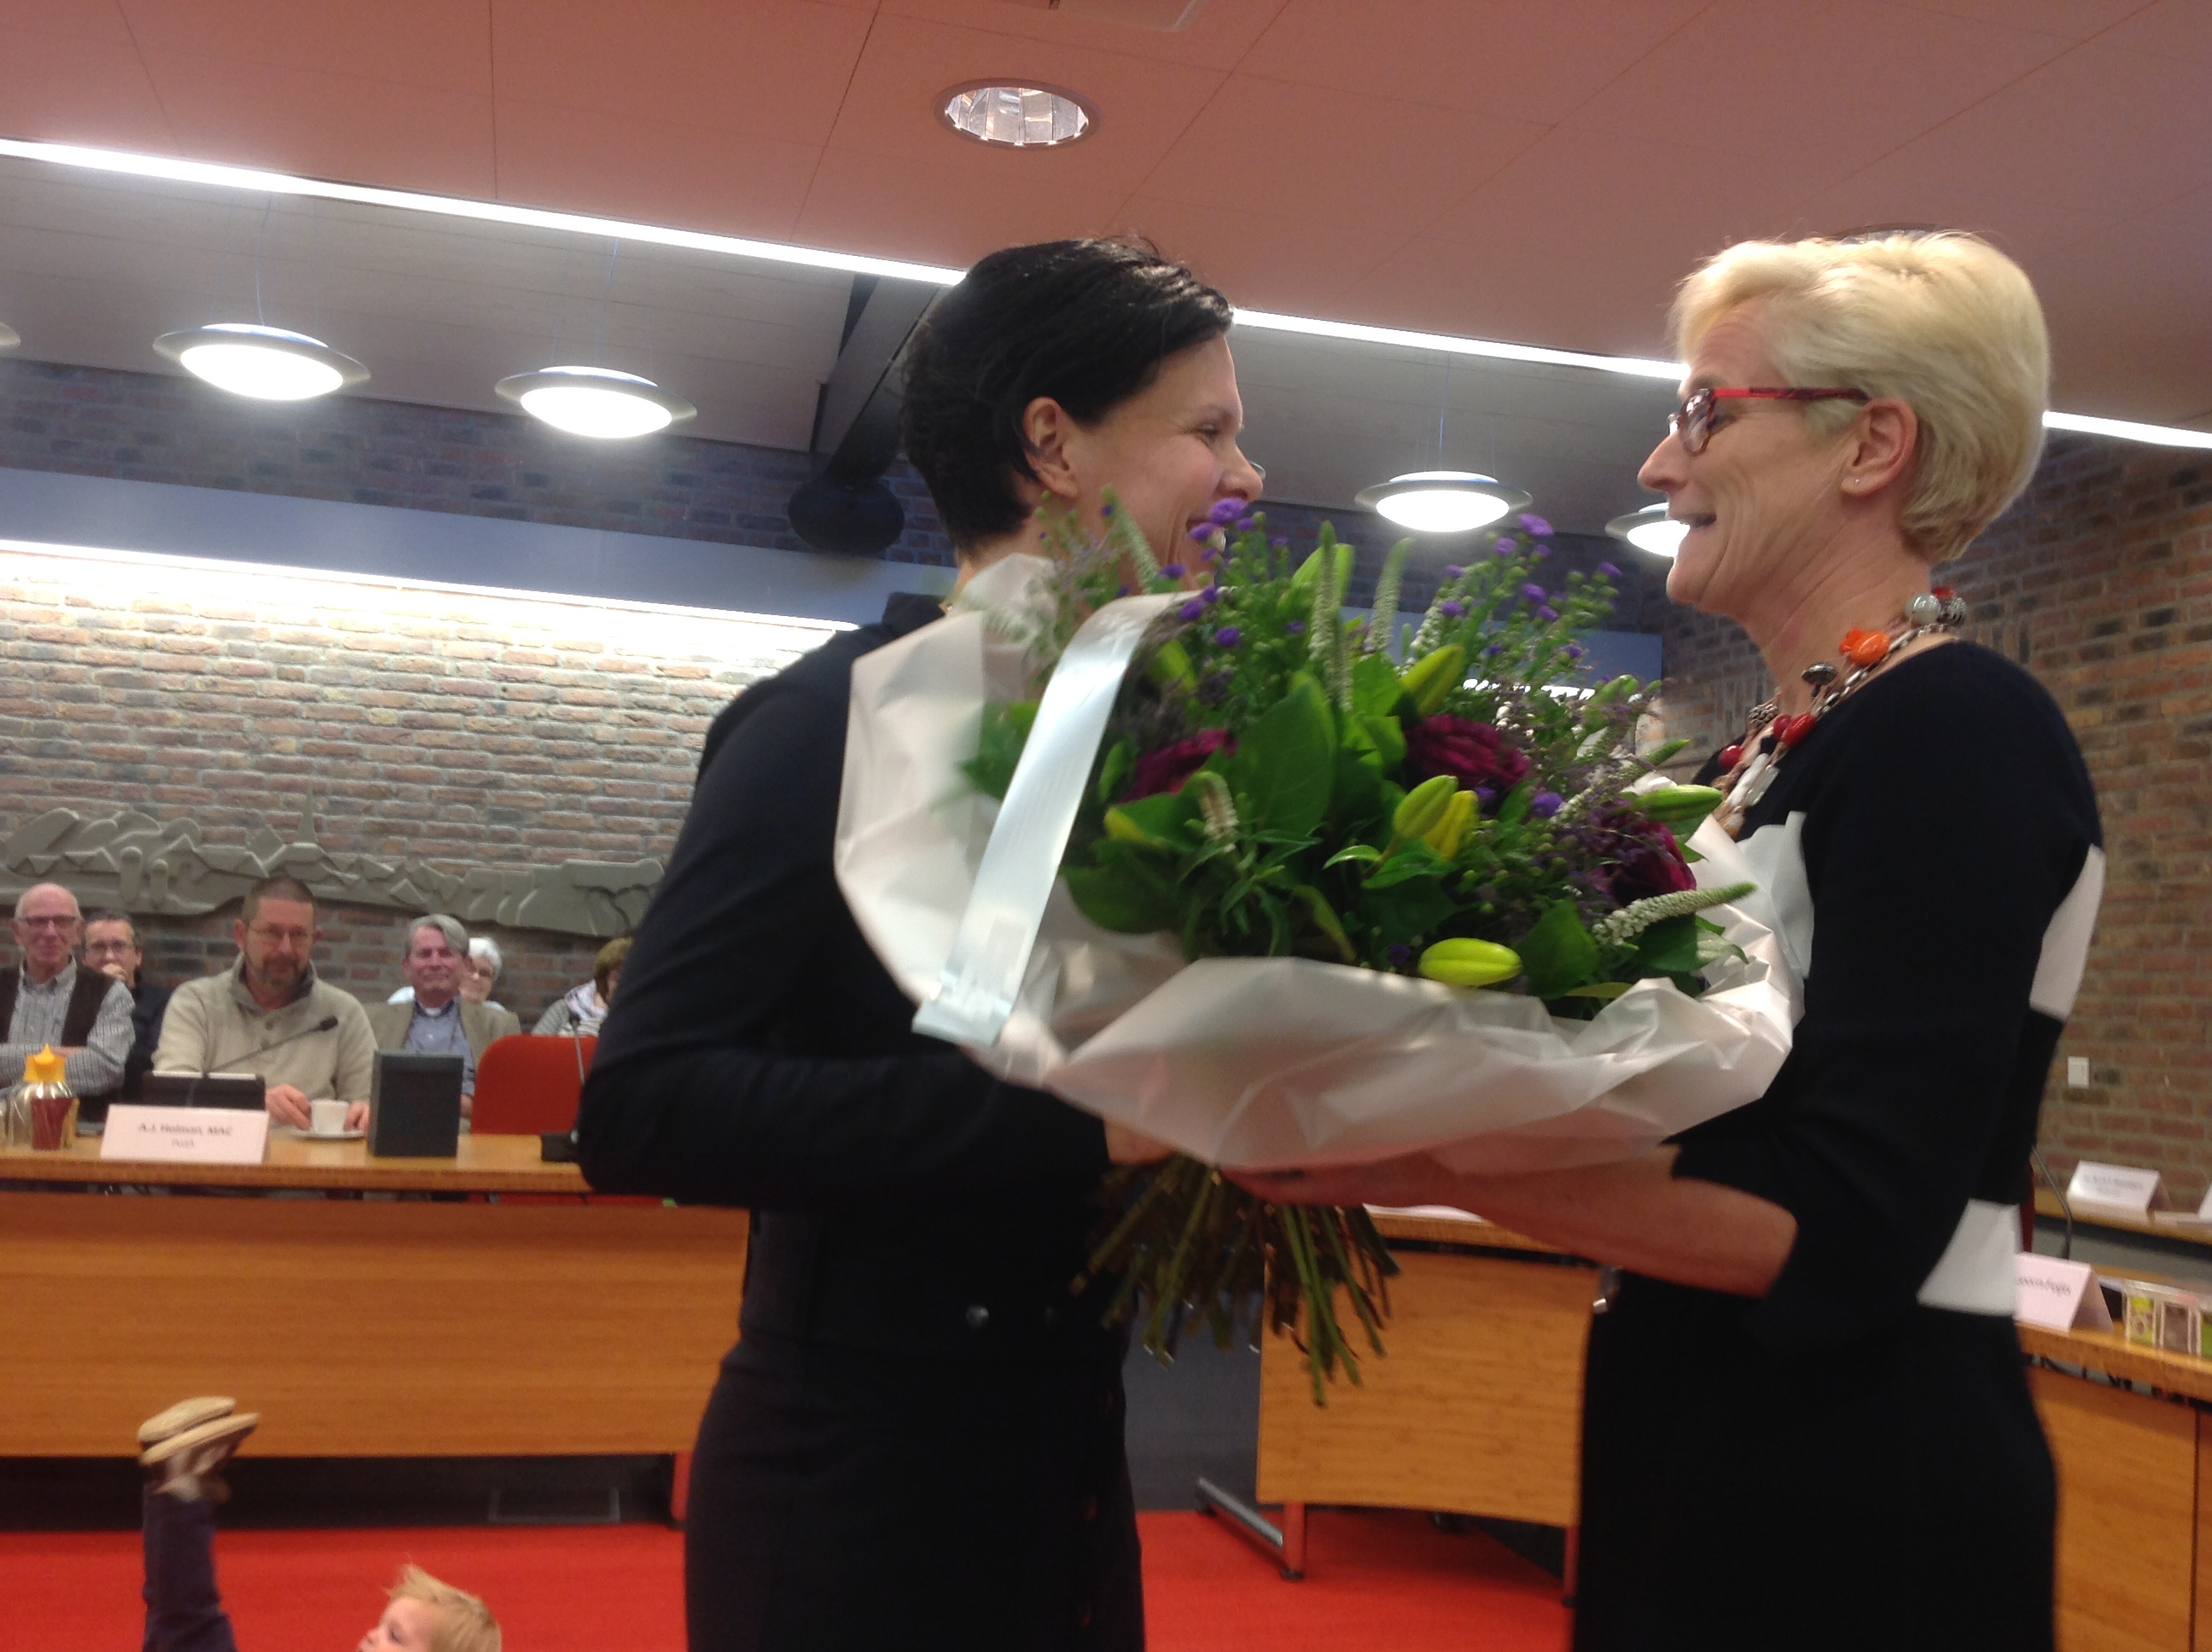 Nieuwe wethouder Debbie Heesakkers benoemd